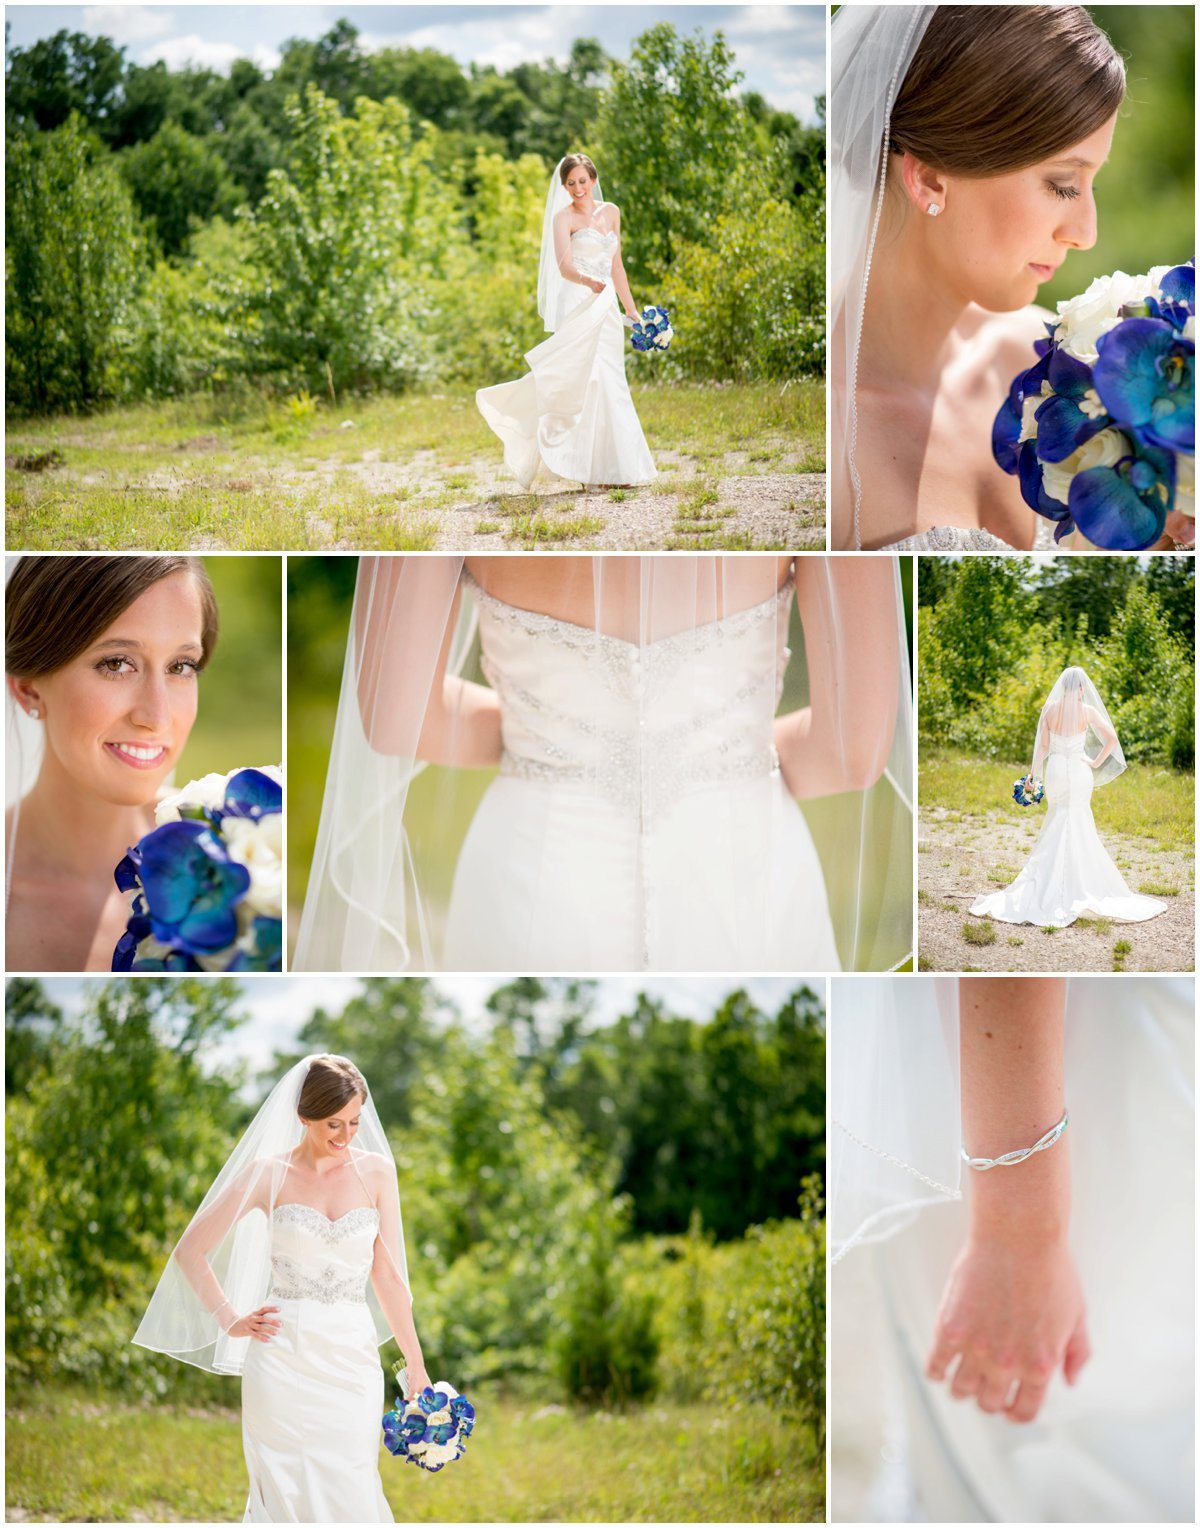 Mavris-wedding-pictures-Nate-Crouch-005.jpg